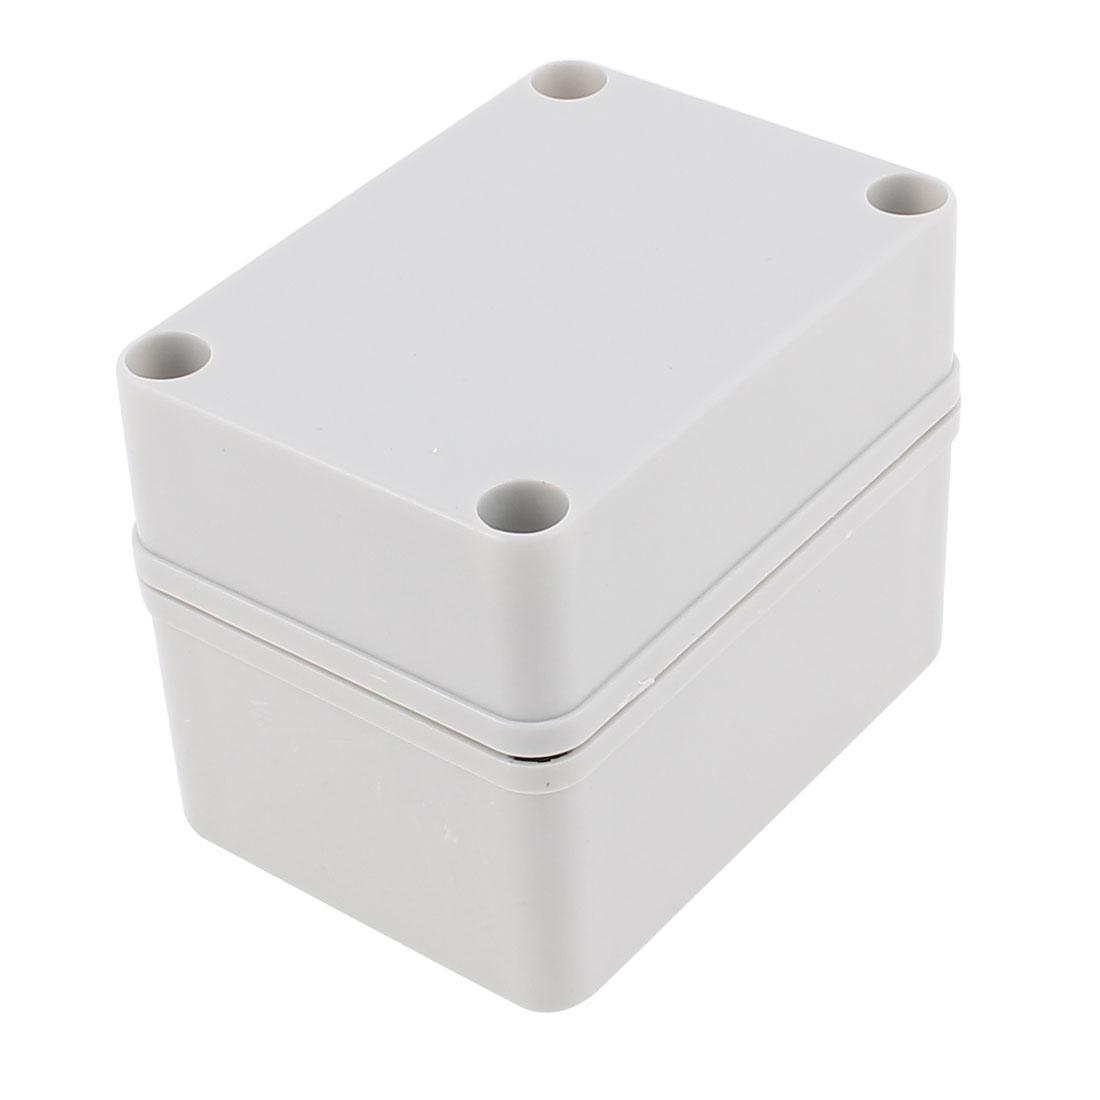 110 x 85 x 80mm Dustproof IP65 Junction Box Terminal Connecting Box Enclosure